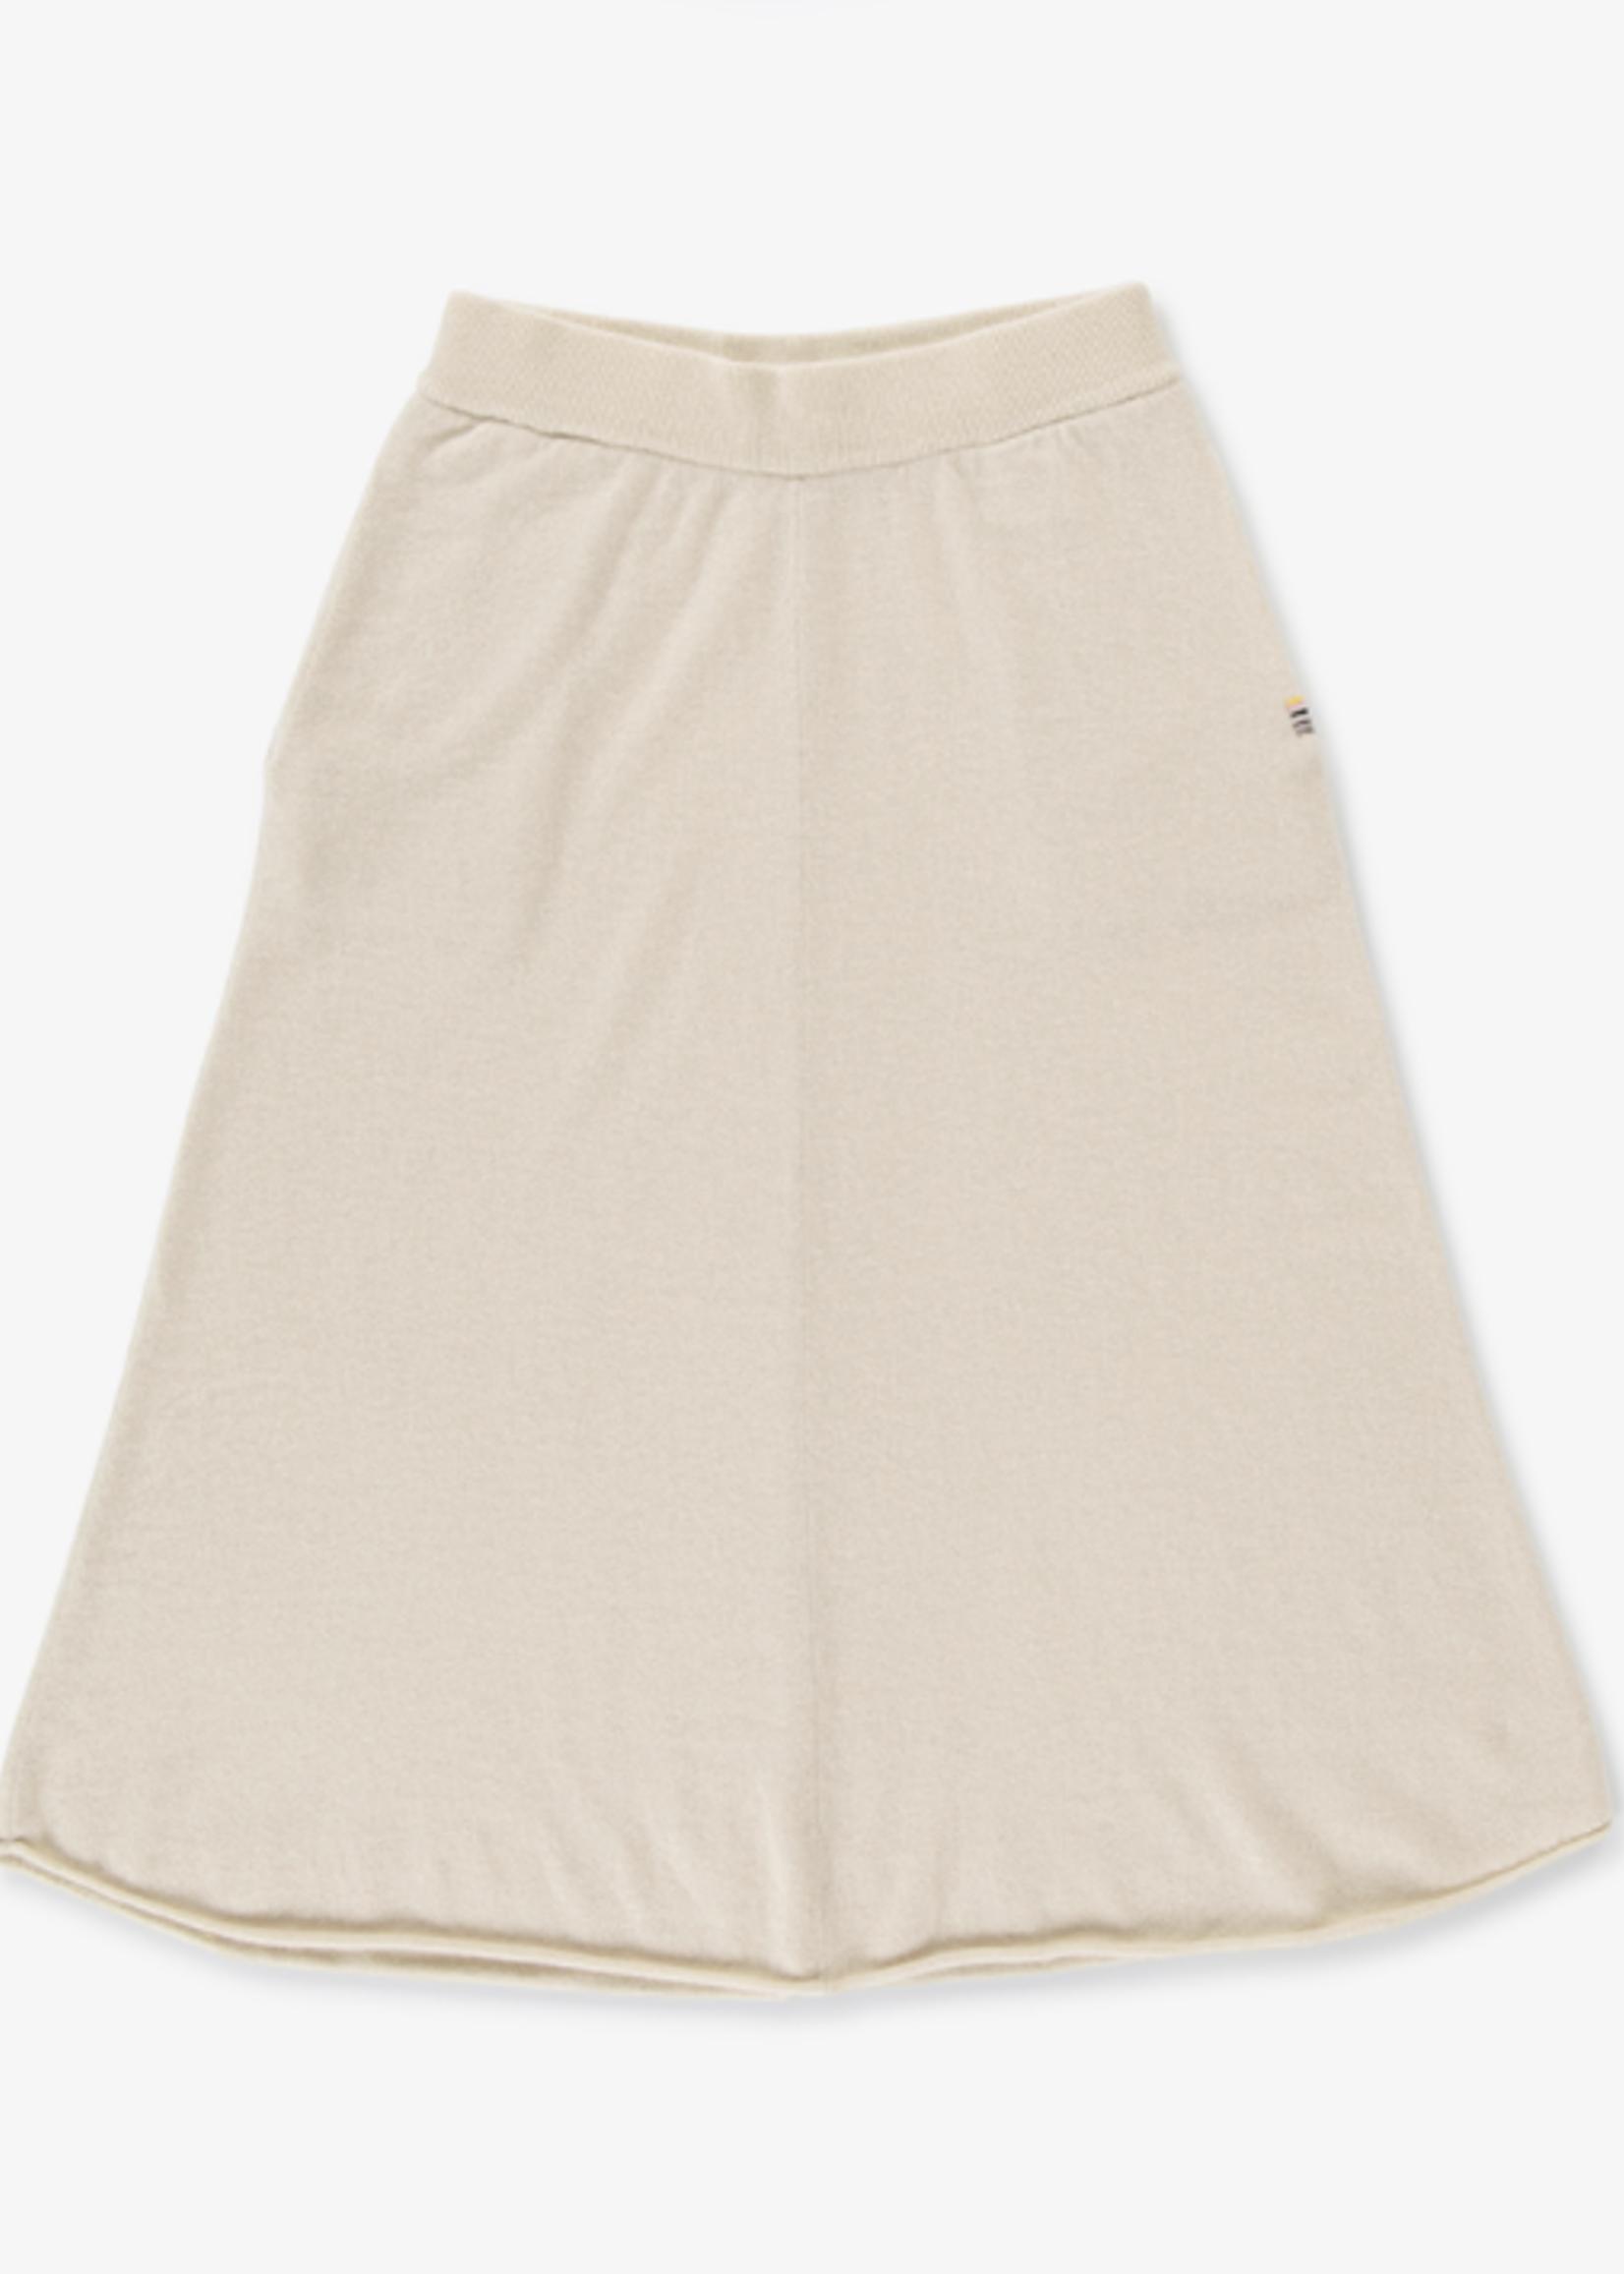 extremecashmere x extreme cashmere midi beige skirt